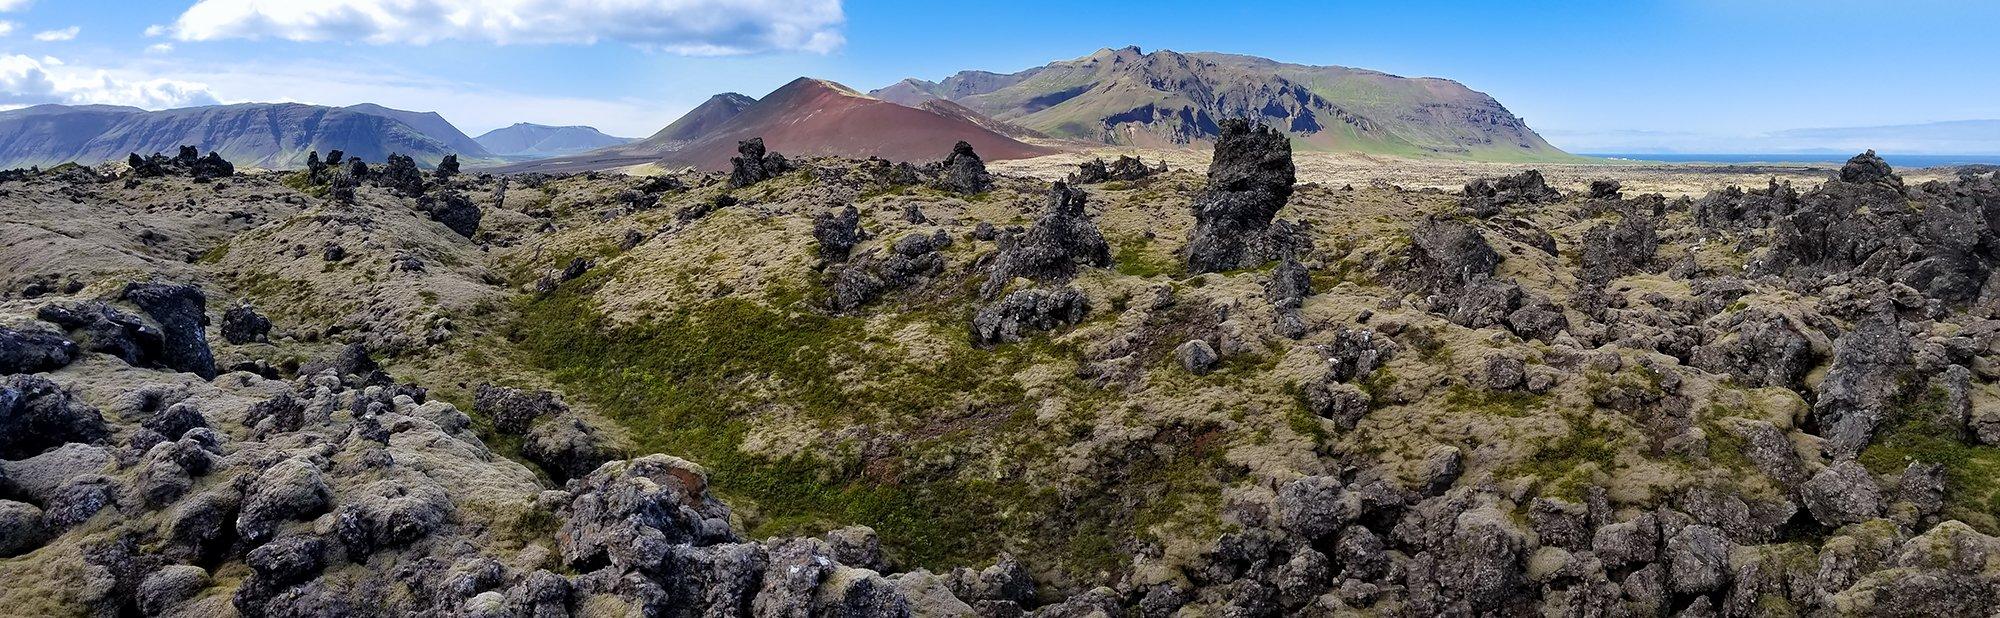 Lava flow on the Snaefellsnes Peninsula